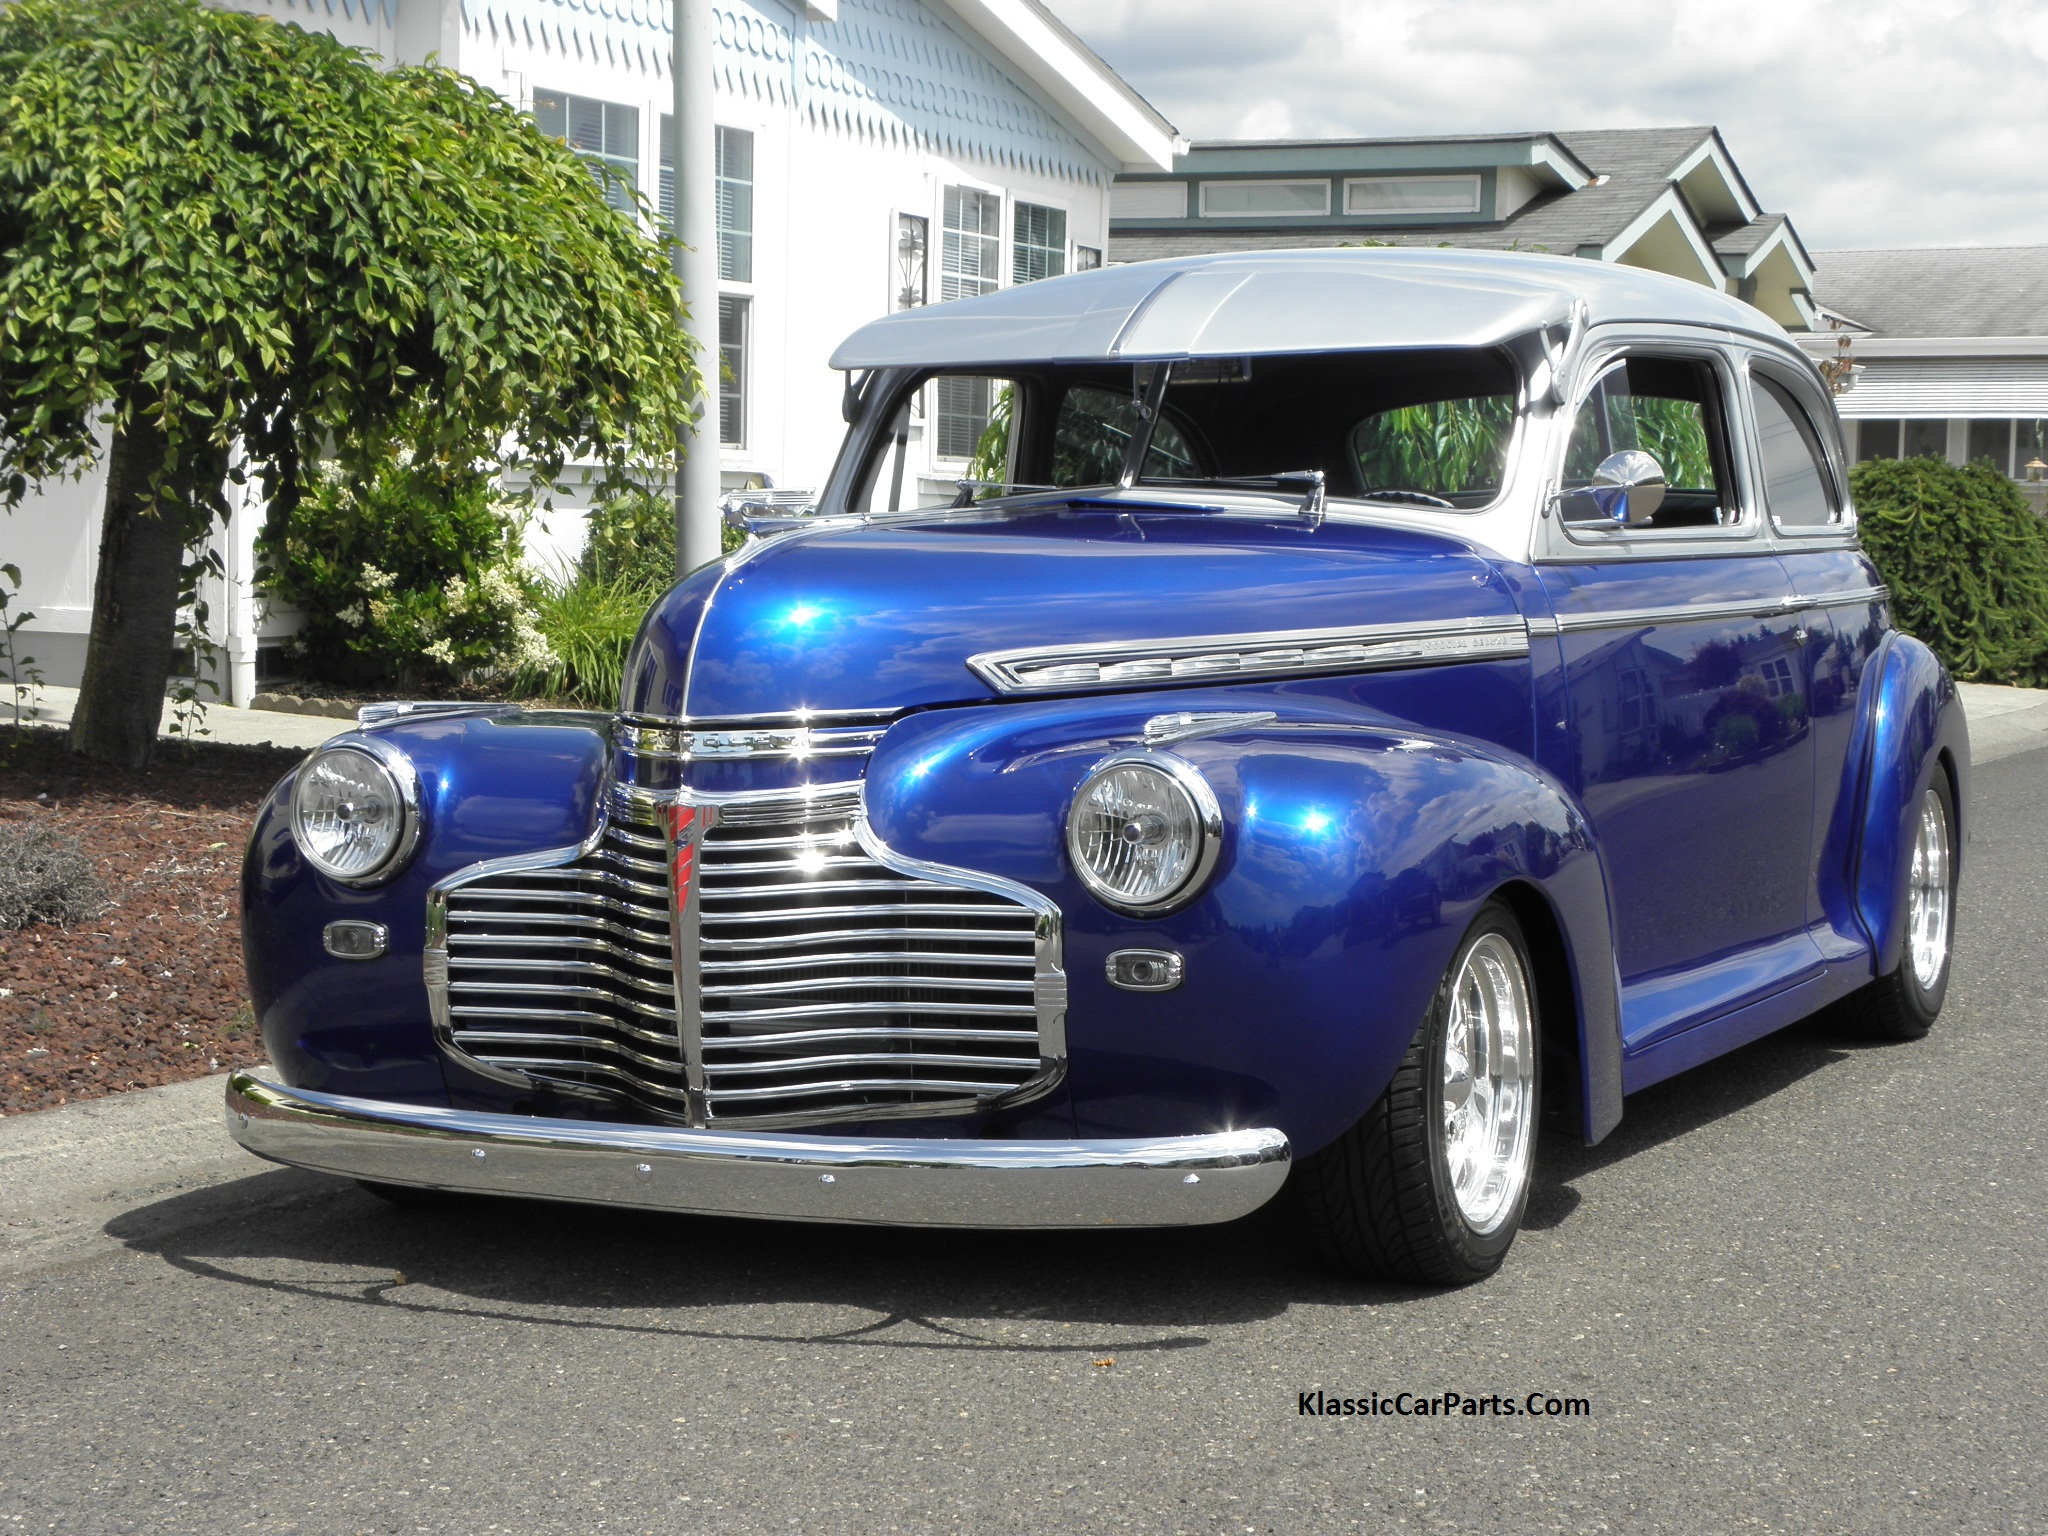 Chevrolet Special DeLuxe 1941 - 1948 Sedan #1